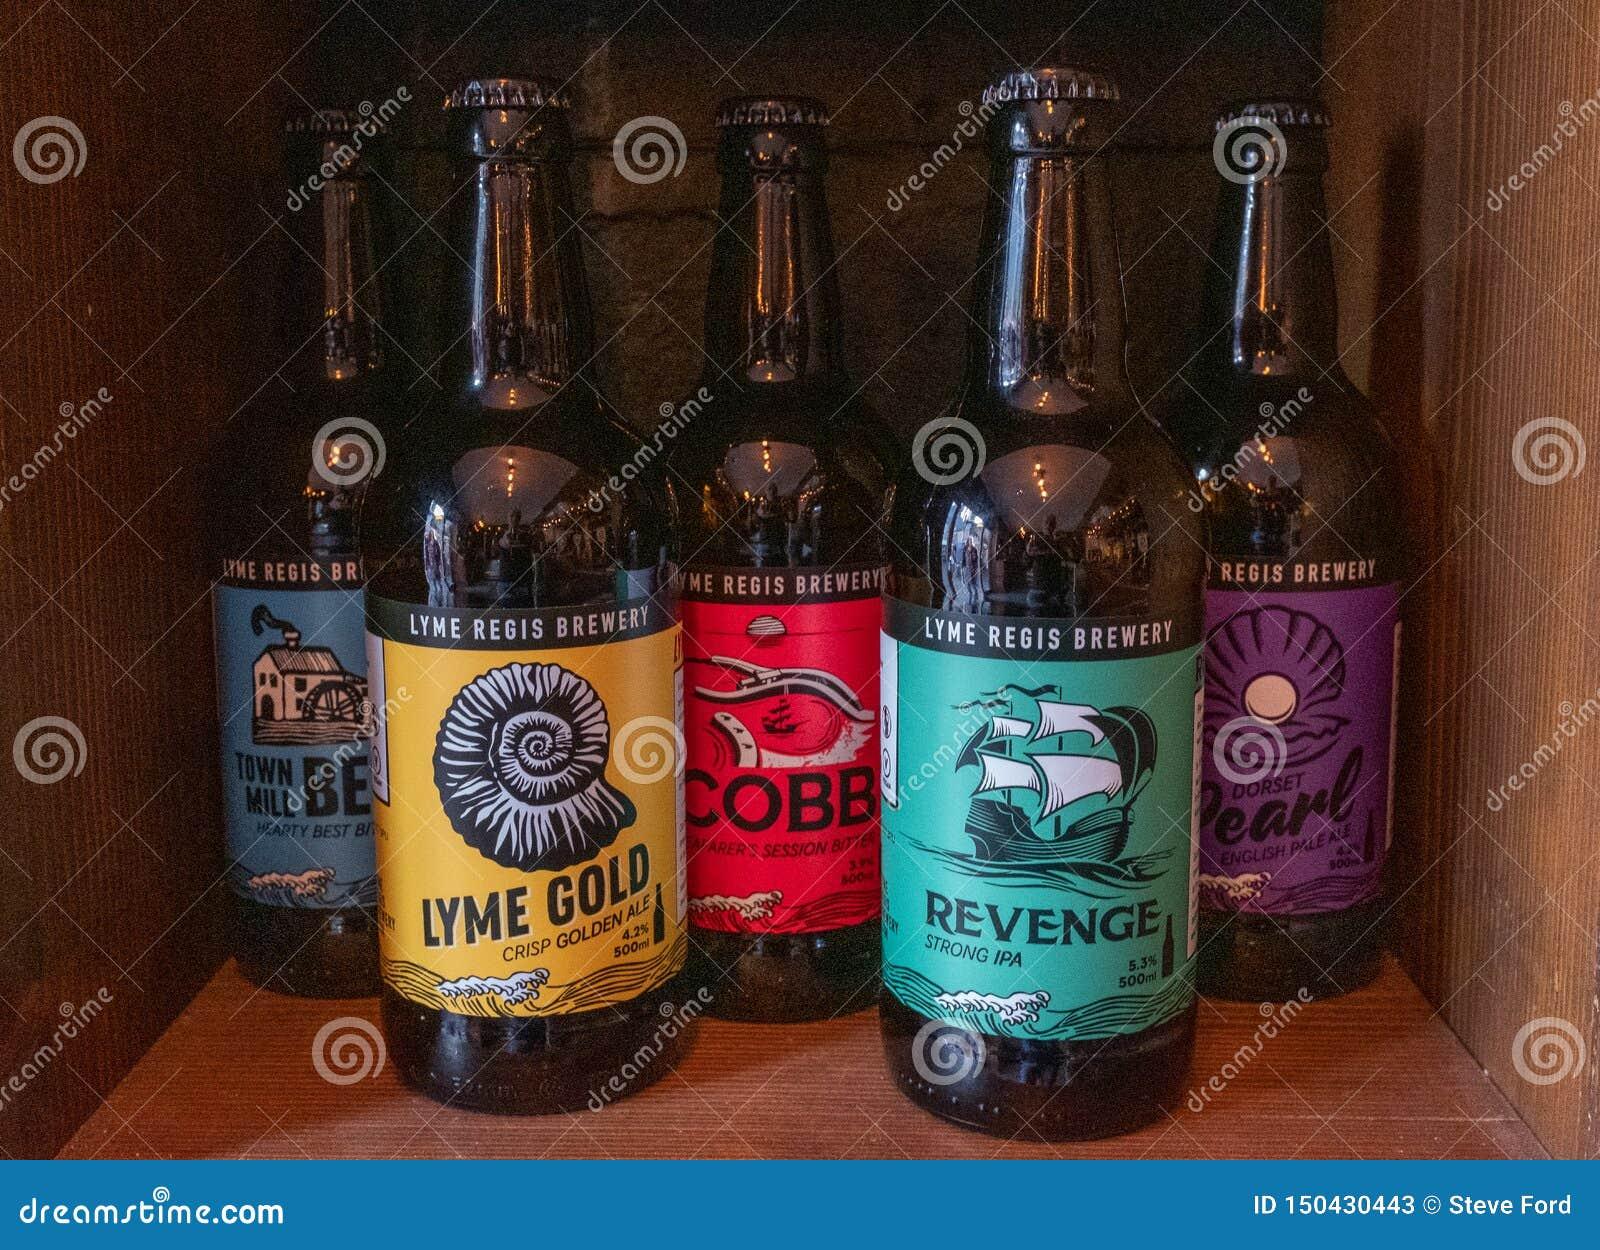 Lyme Regis, Dorset, England, February, 24, 2019: Bottles of craft beer lined up on a shelf at the Lyme Regis gBrewery